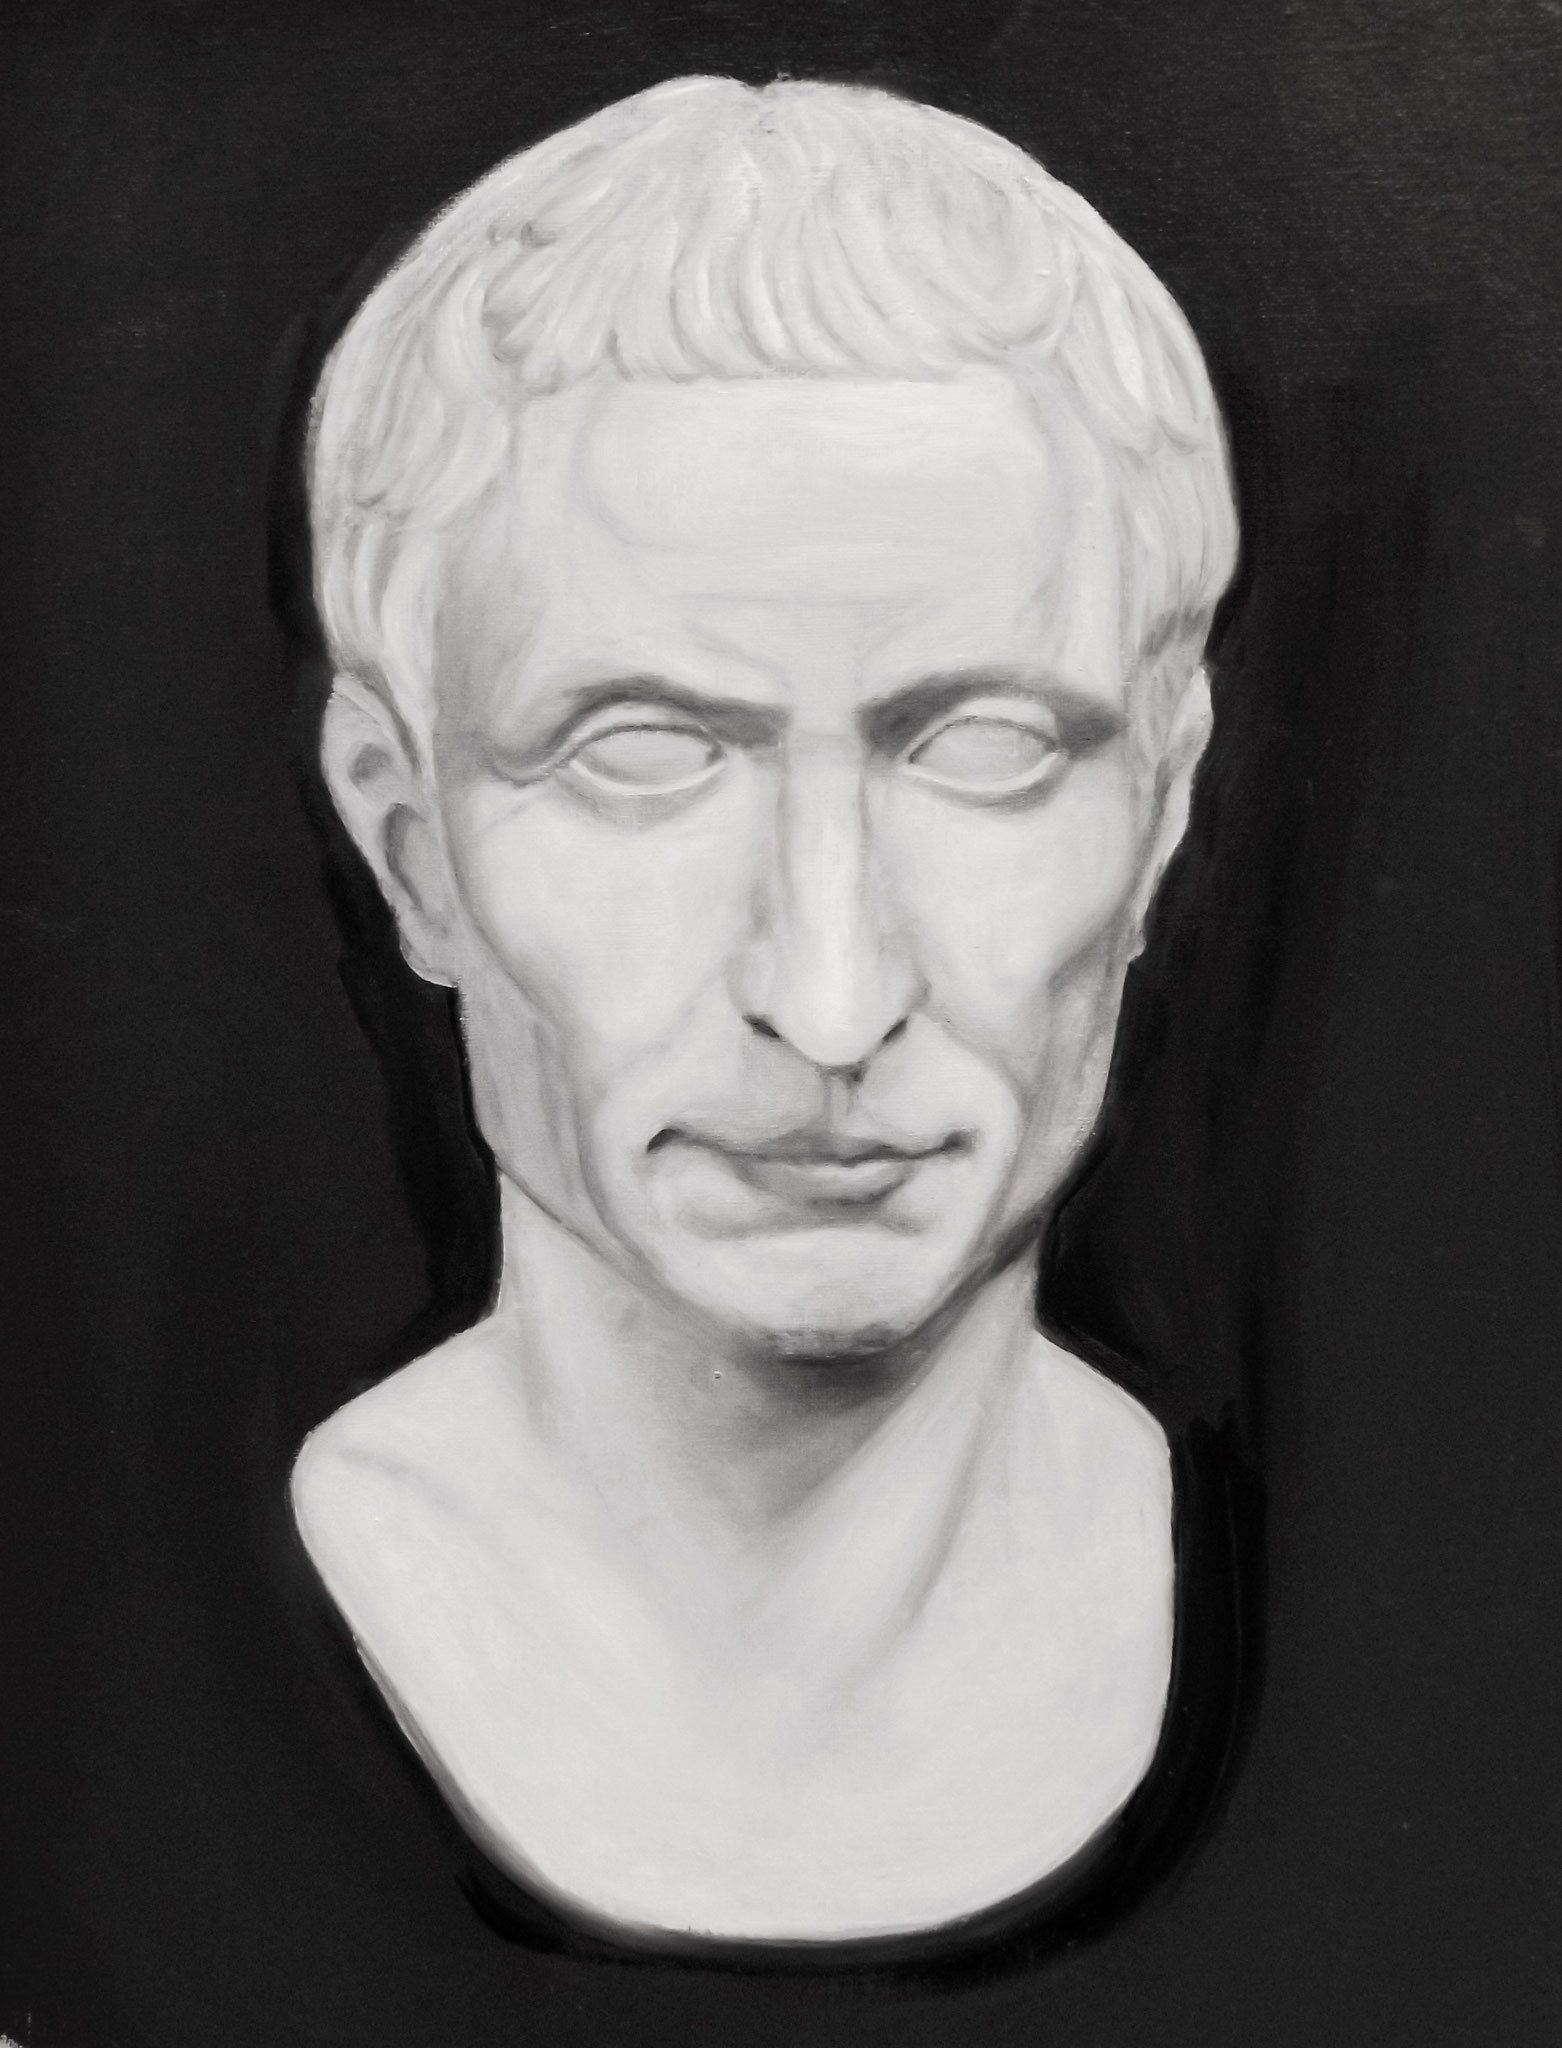 Cesar, Oilpainting, 40x30 cm, 2015